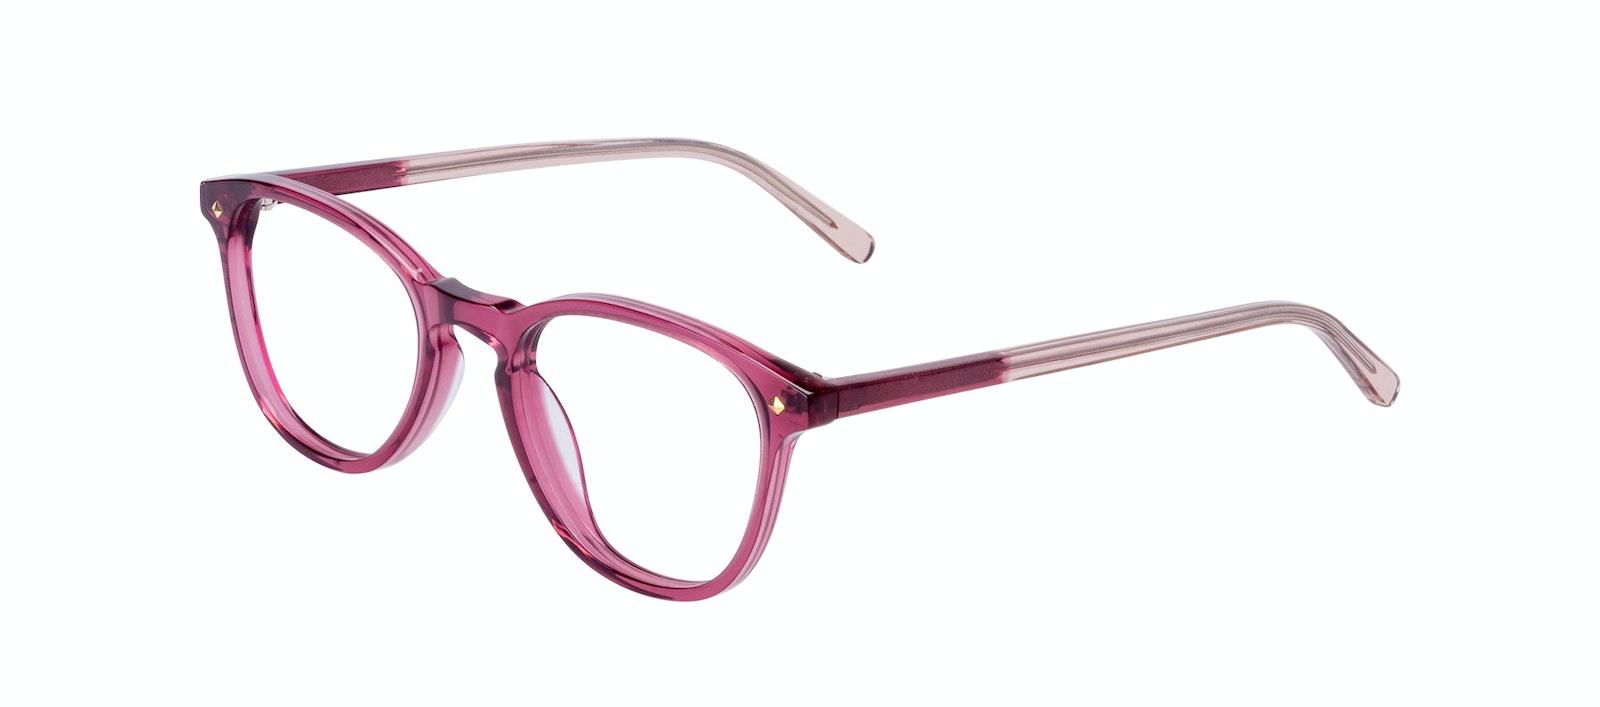 Affordable Fashion Glasses Round Eyeglasses Women Crush Berry Tilt